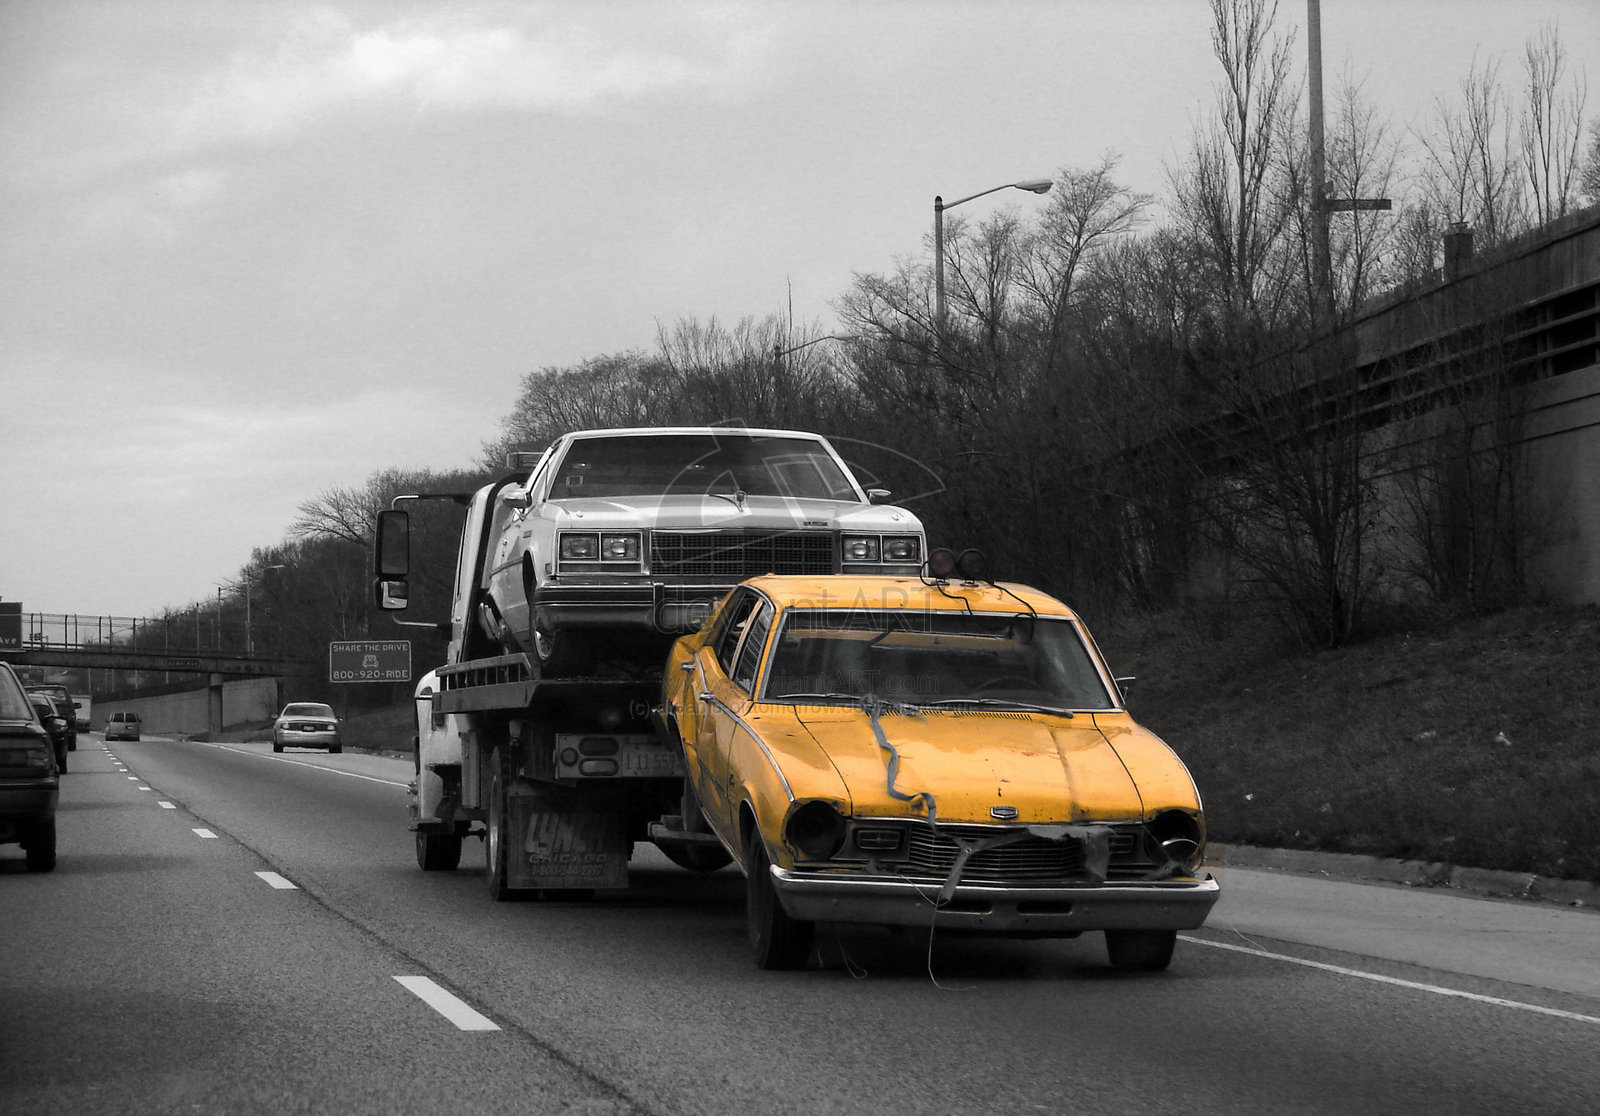 Junk_Car_Removal.14002301 - копия